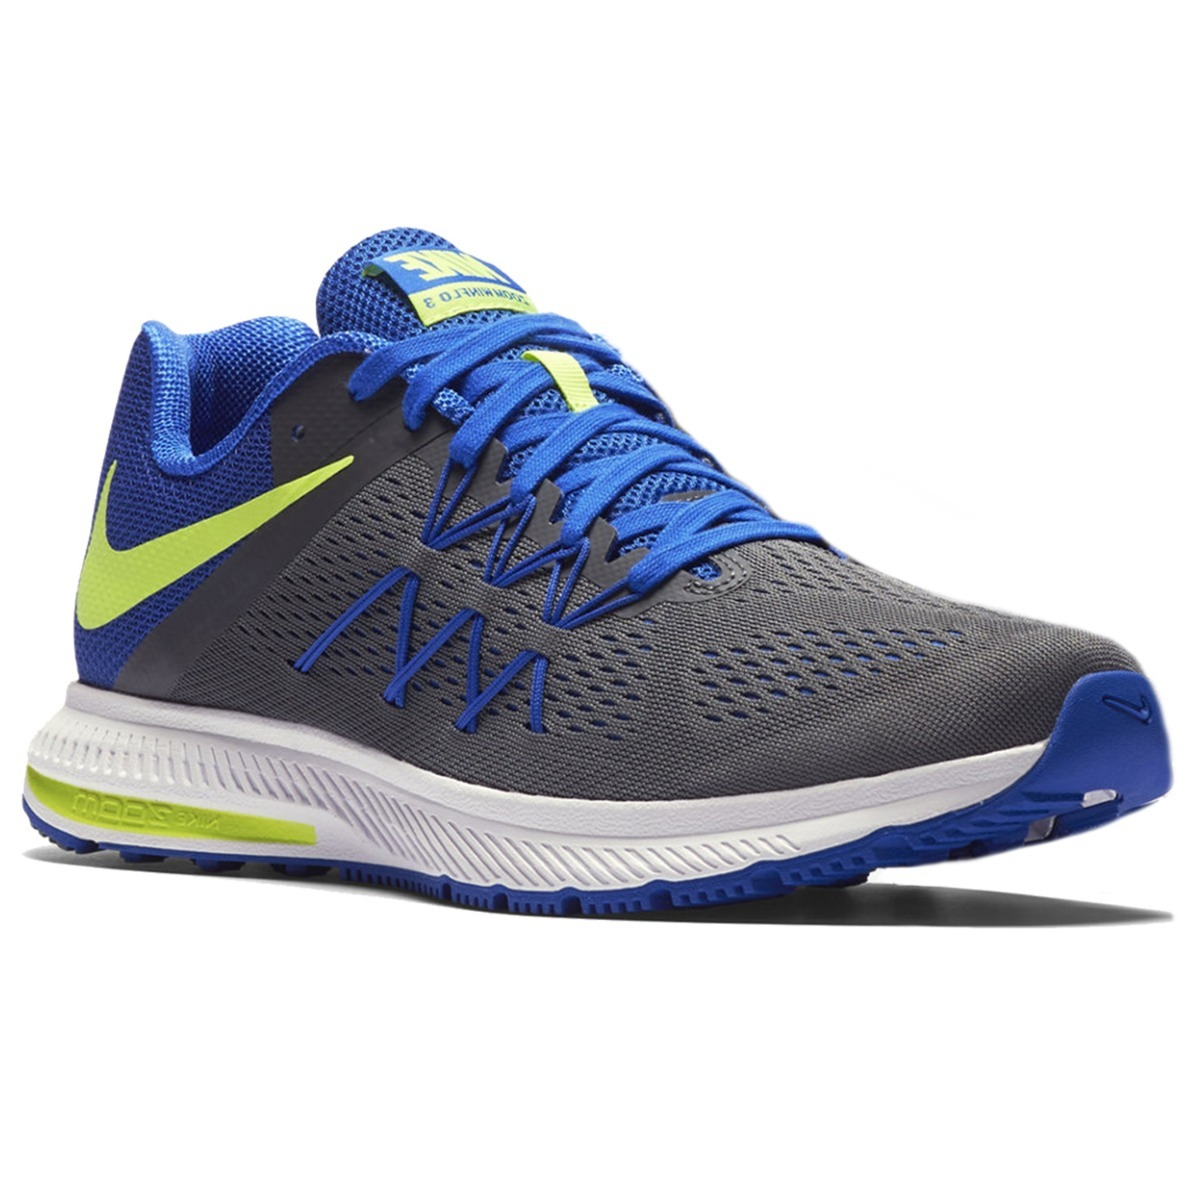 99b2adba689 ... new zealand tenis nike zoom winflo 3 gris azul correr running  deportivo. cargando zoom.